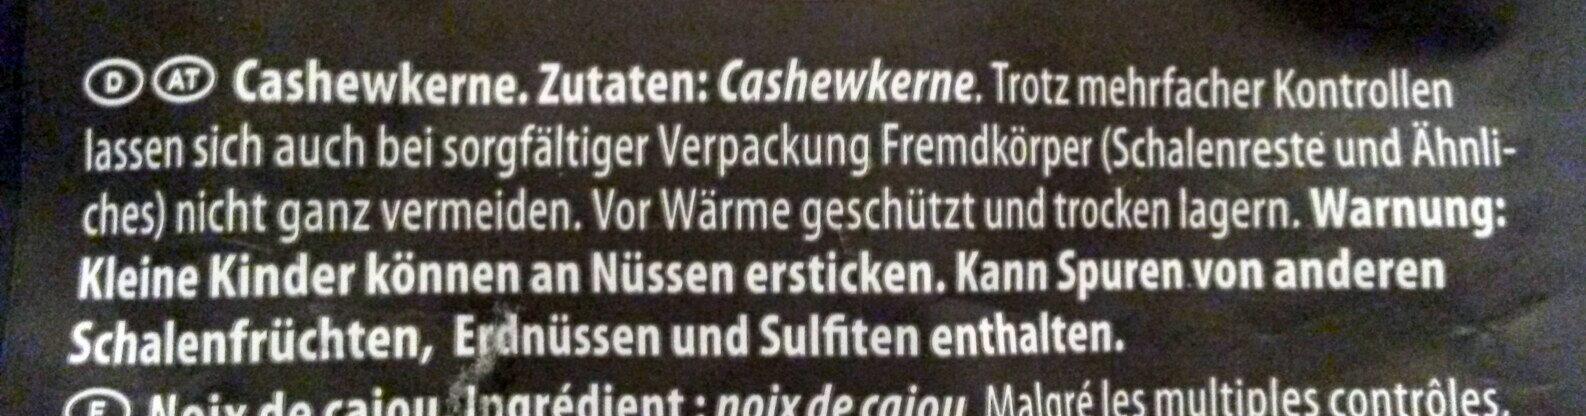 Cashewkerne, Naturell - Ingredienti - de